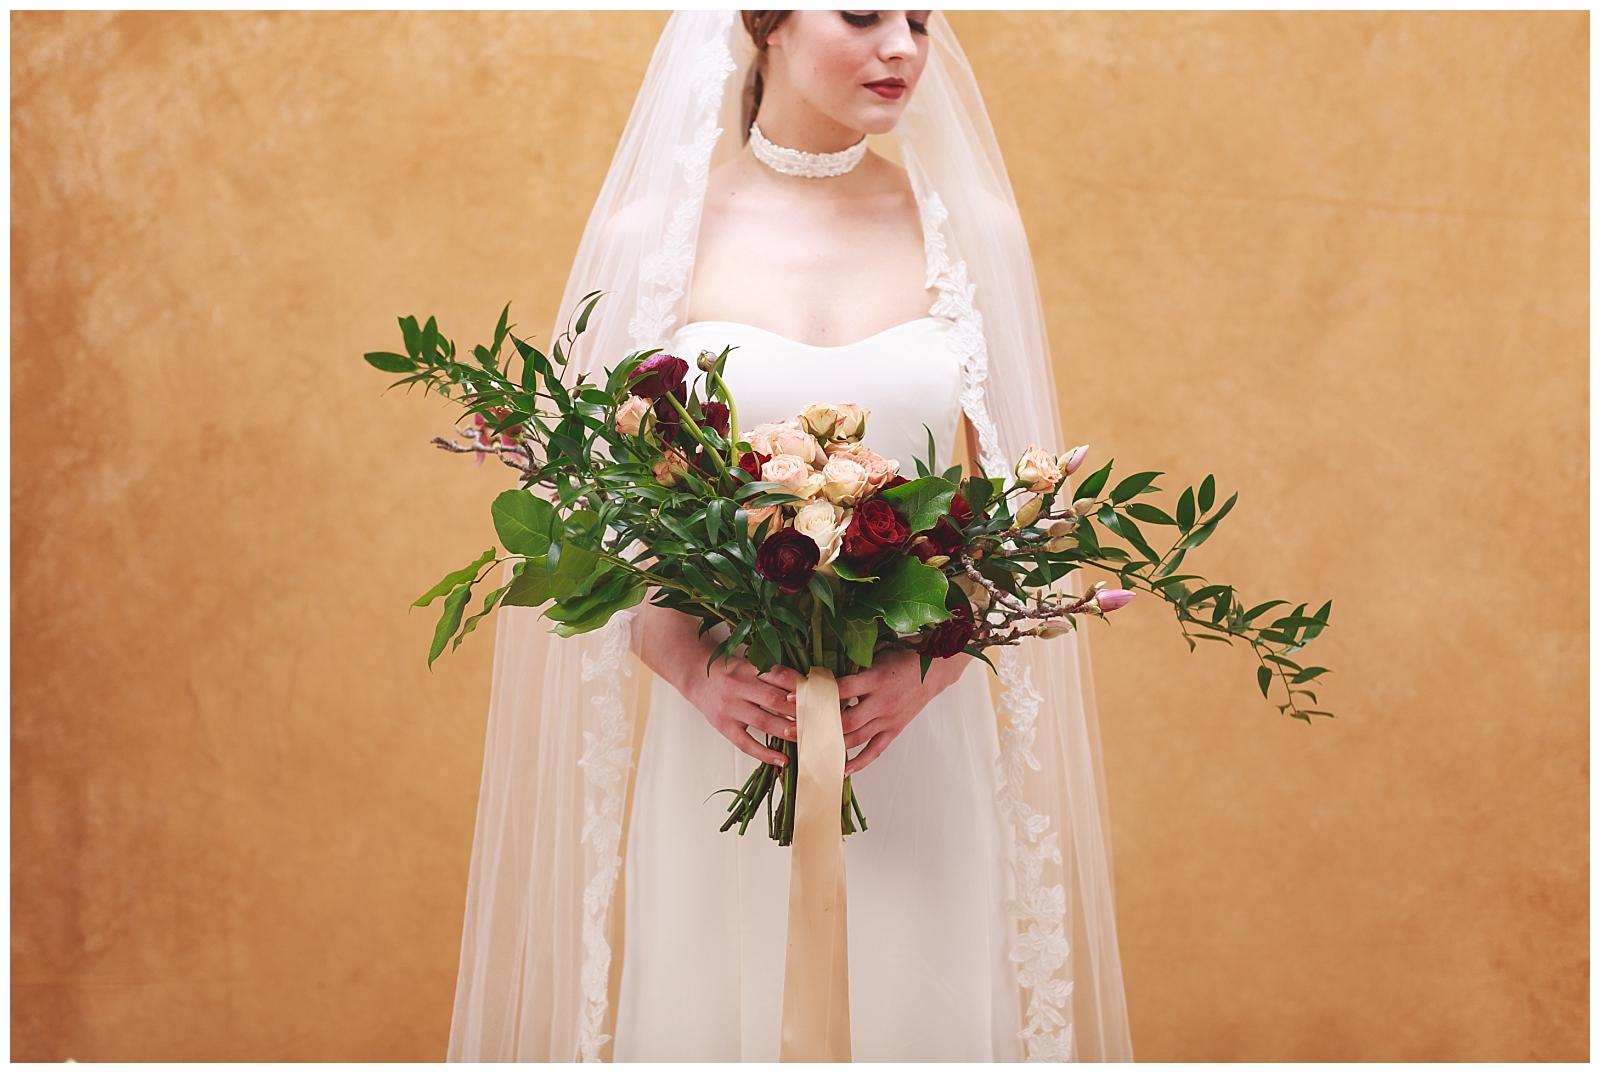 Bridal-Portraits-Modern-Inspiration-Epiphany-Gown-AGS-Photo-Art.jpg